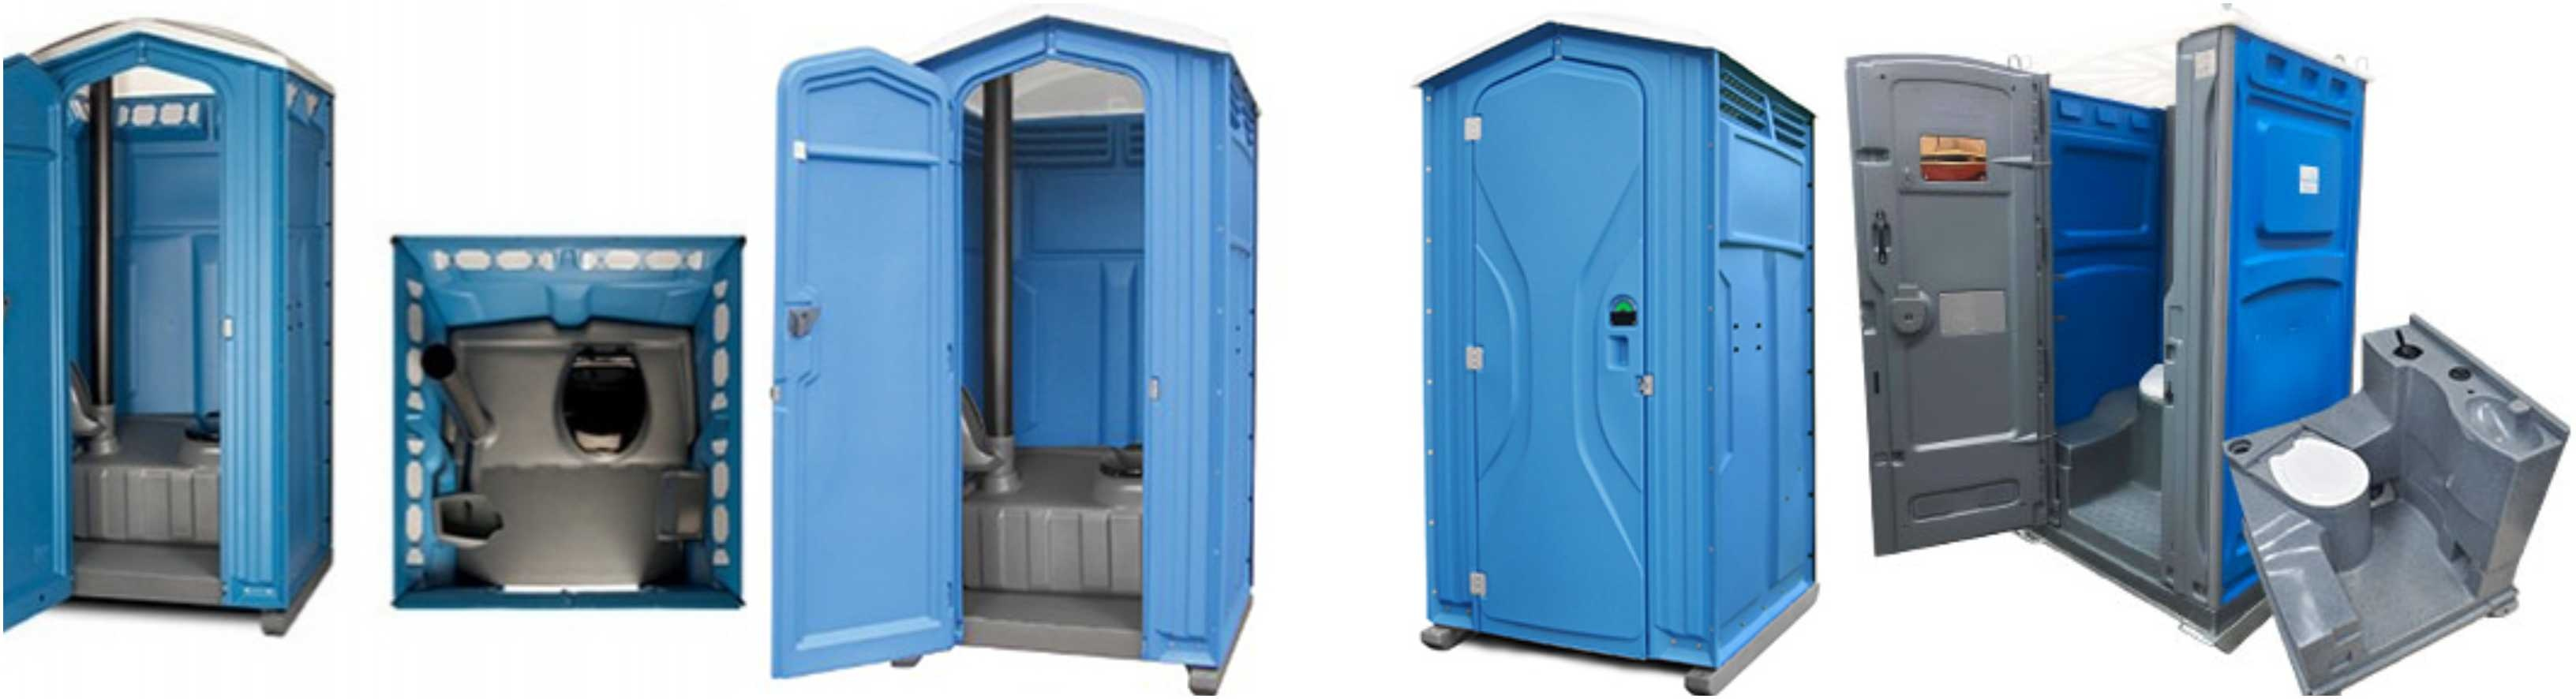 inchirieri toalete ecologice bistrita